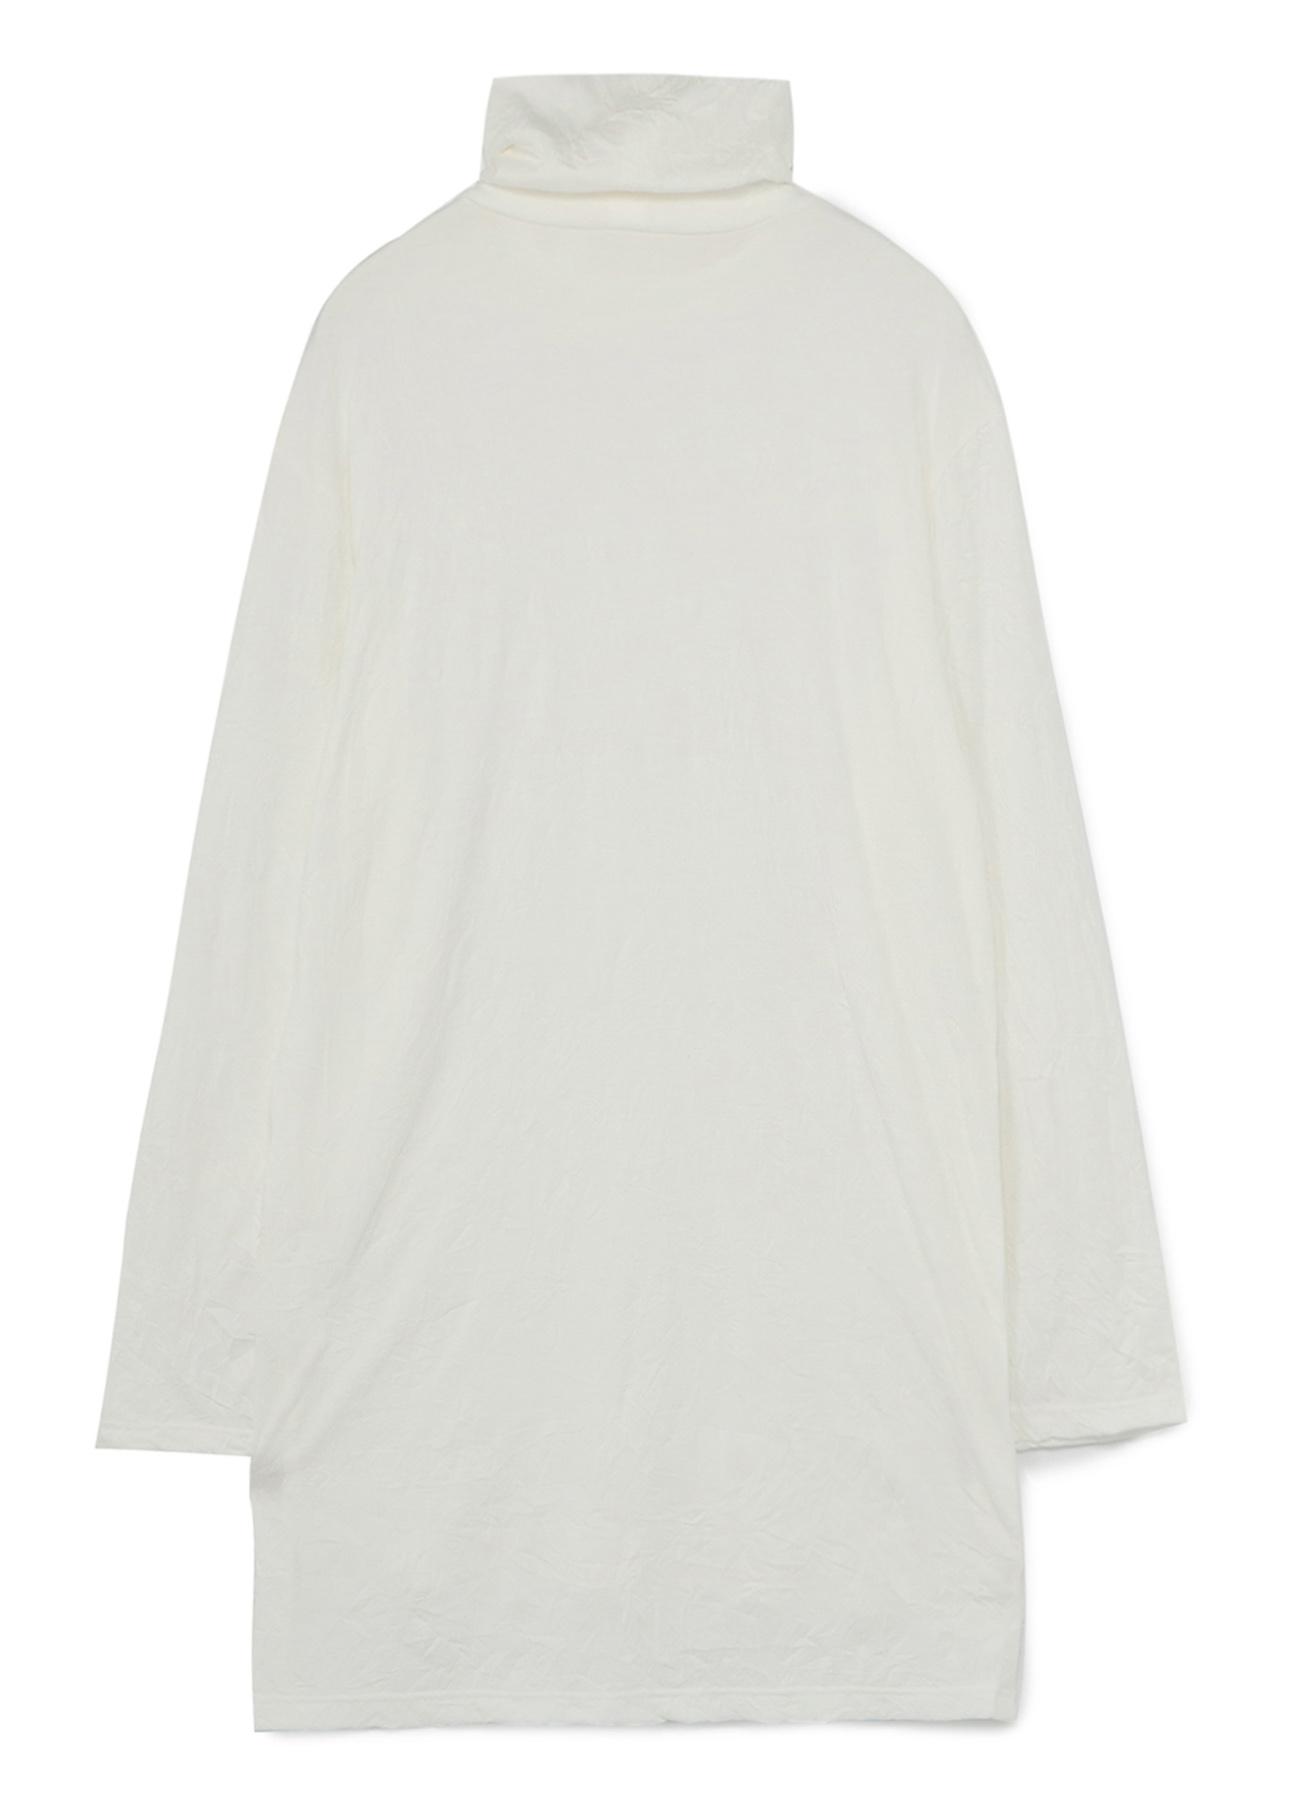 C/Pe Washer Jersey Button Opened Big Turtleneck Cut Sew